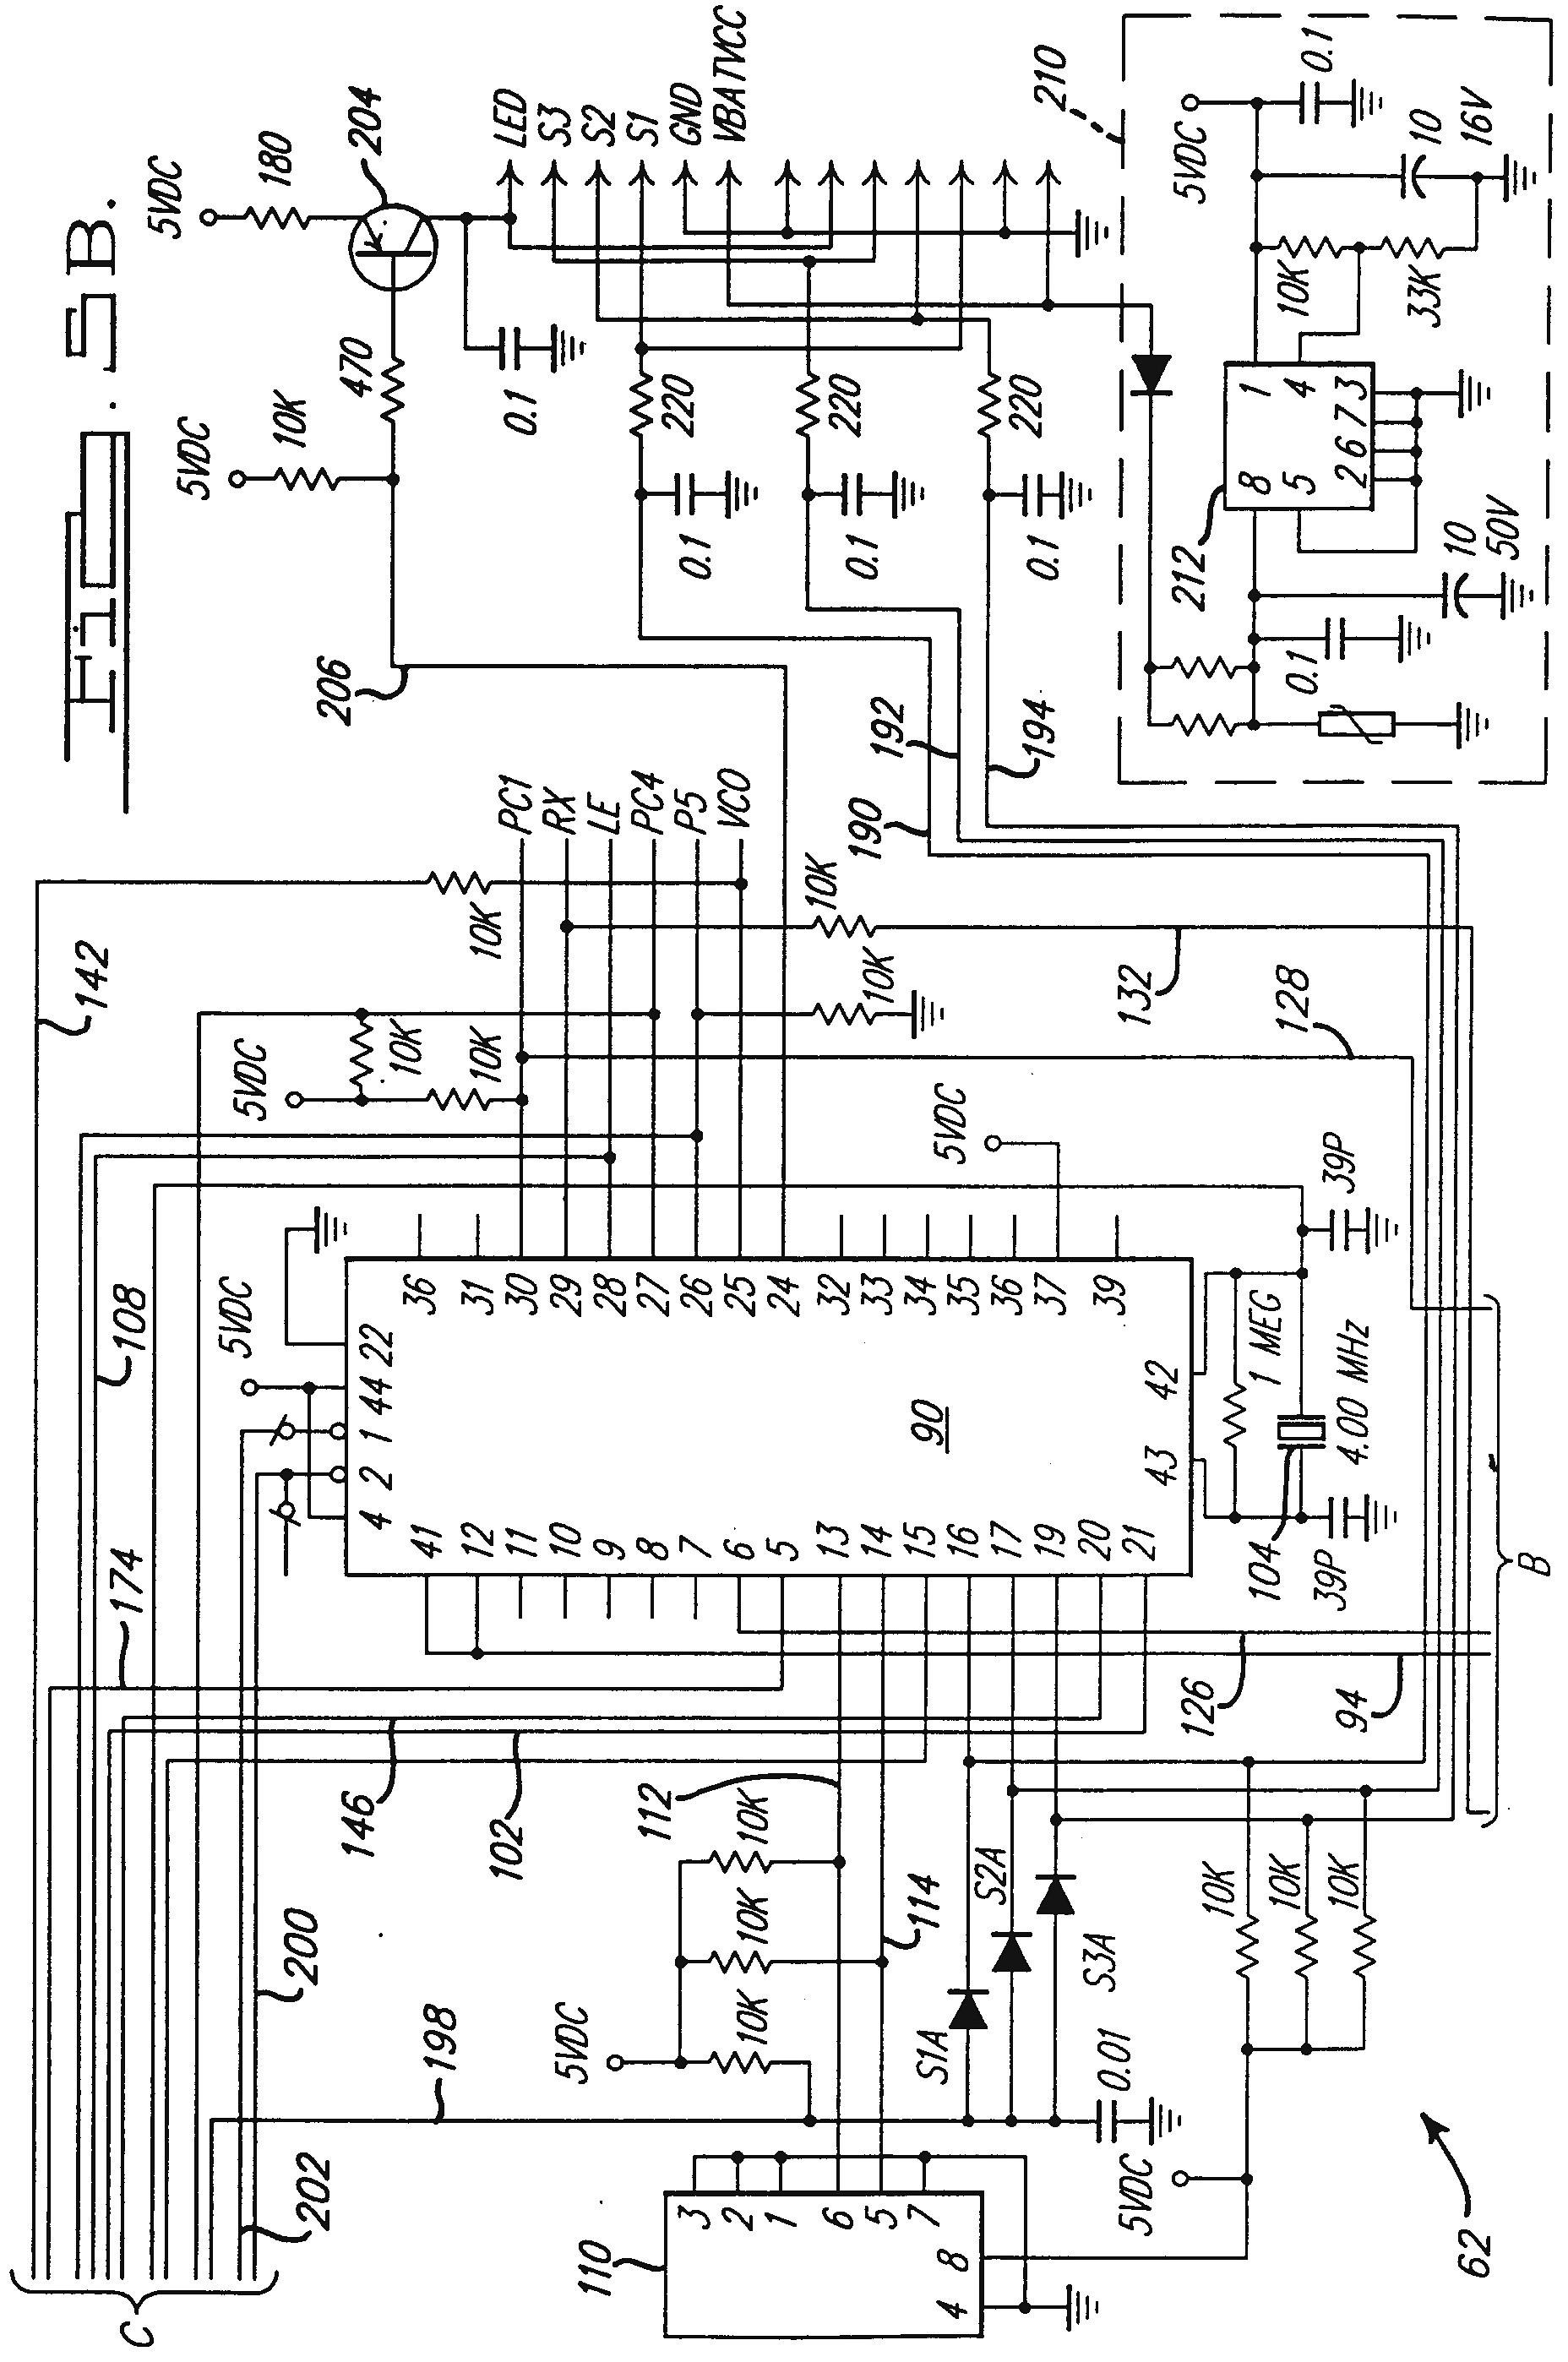 door wiring diagram wiring diagram database